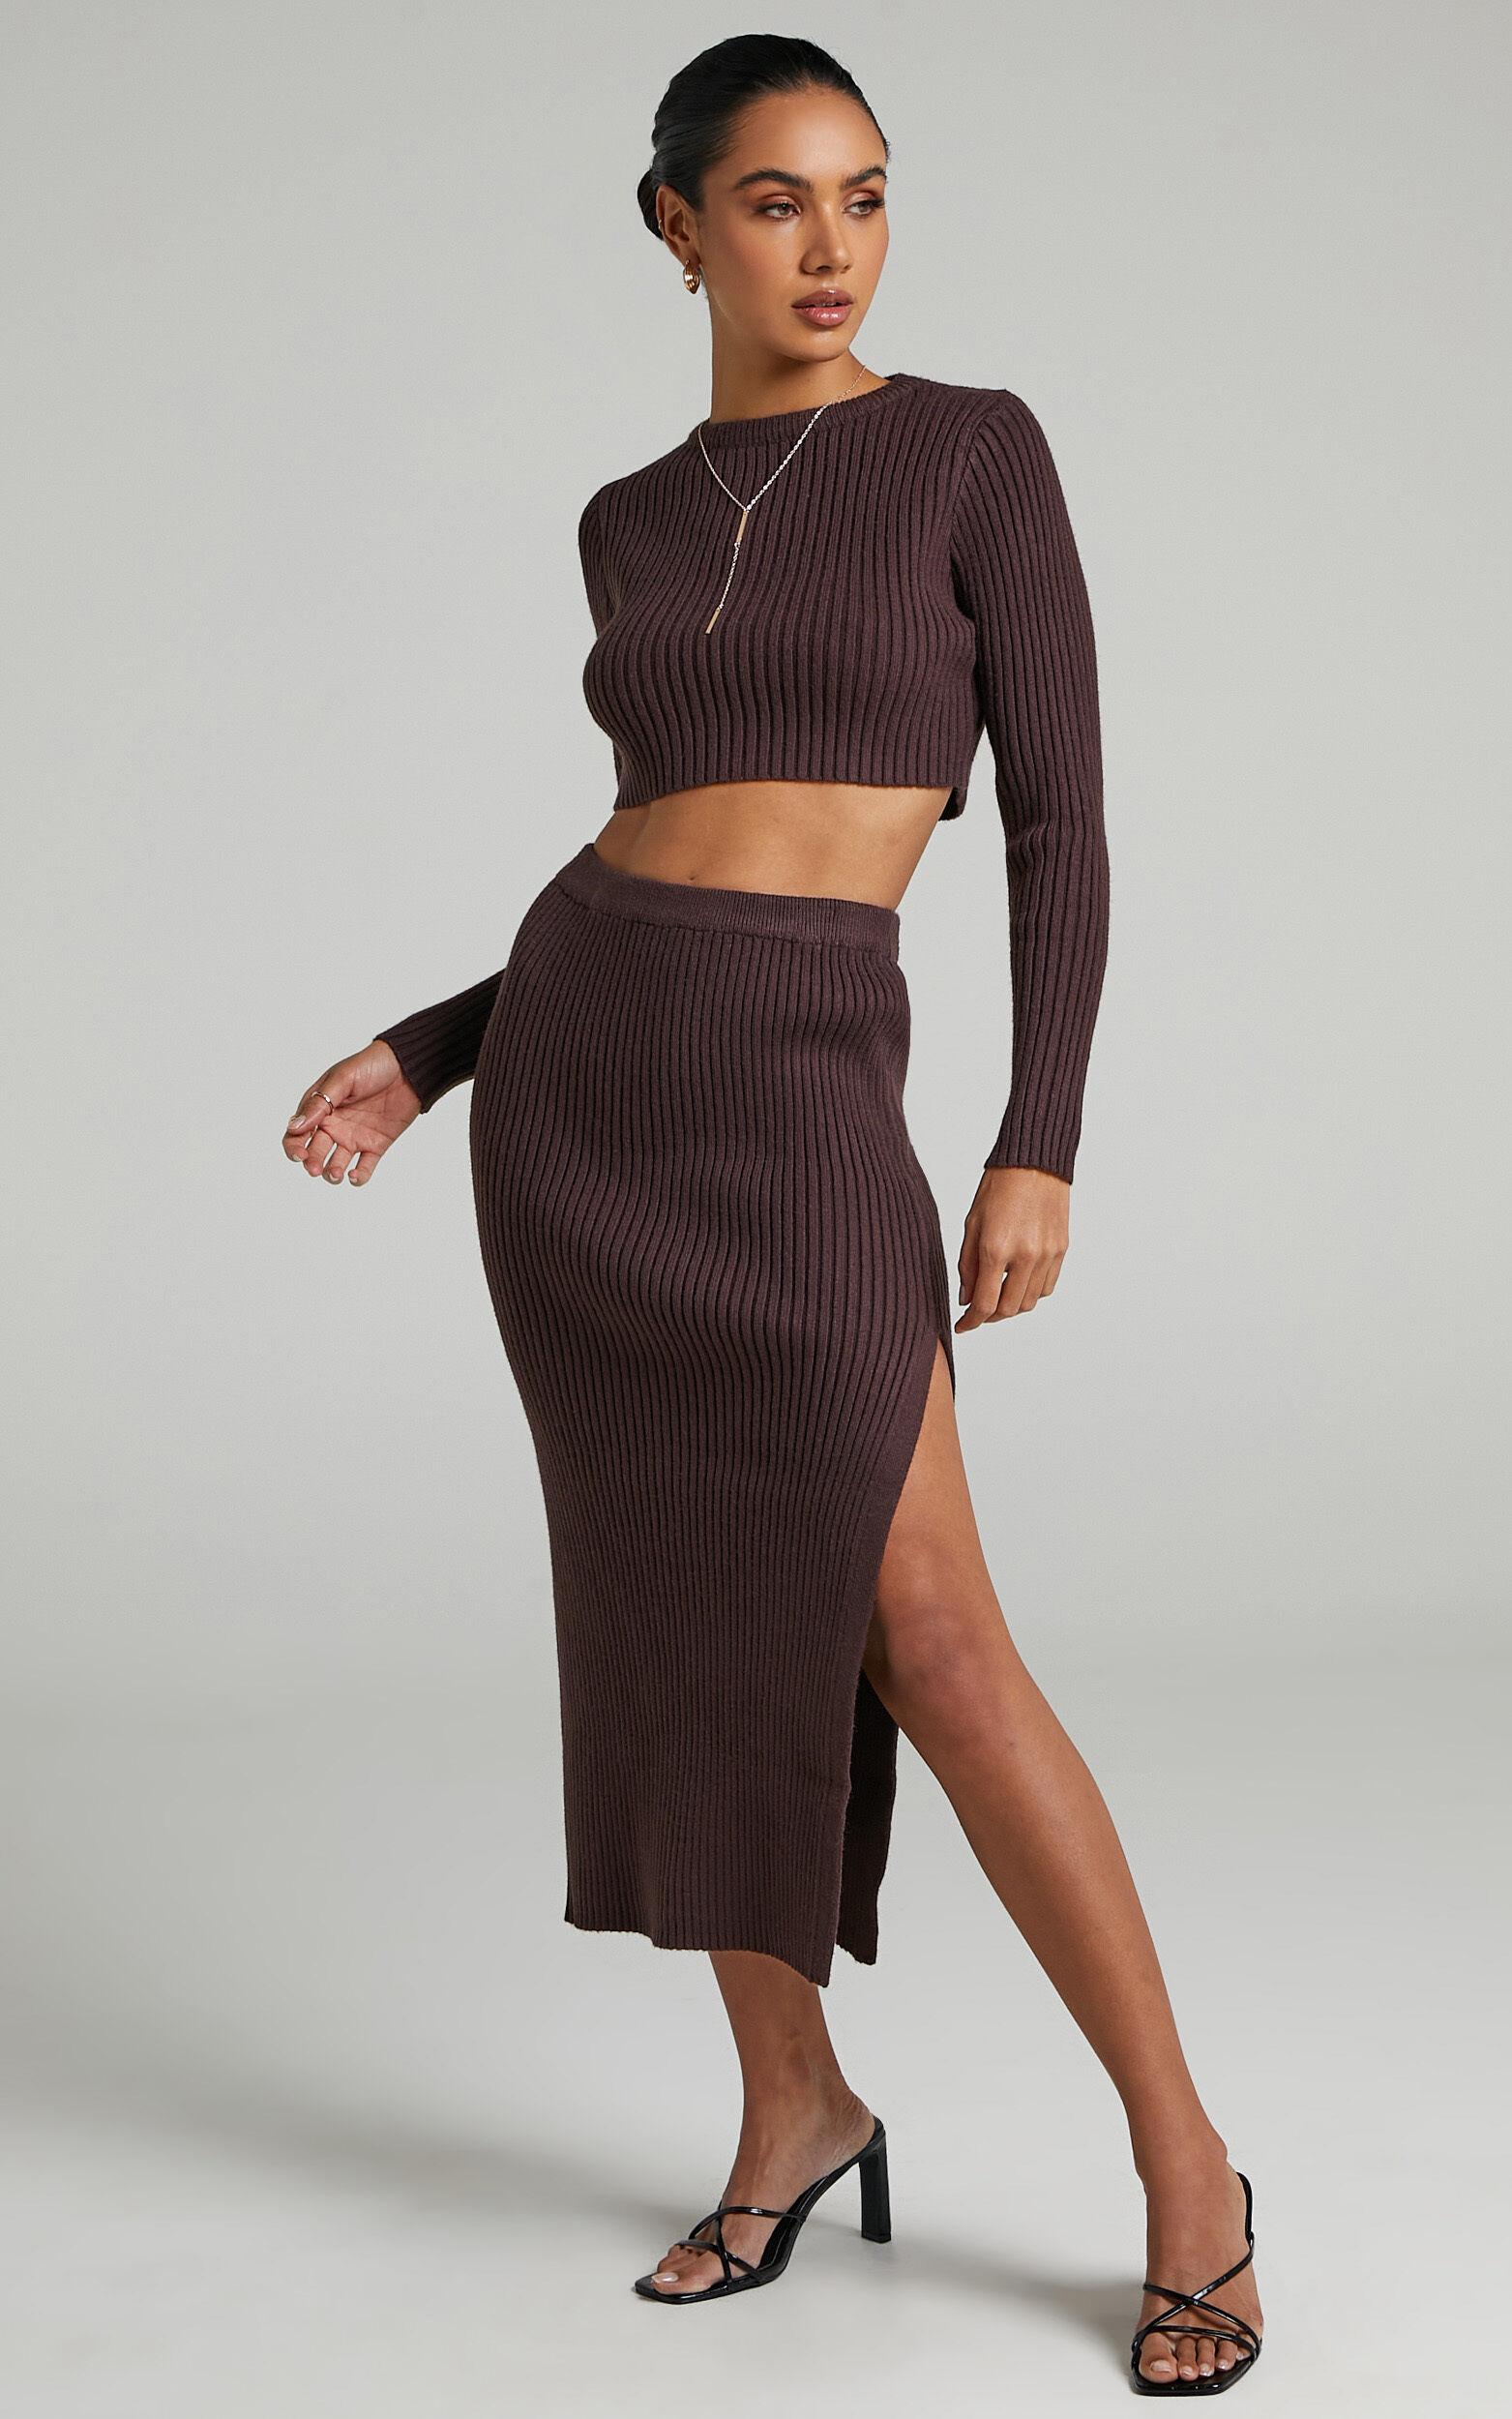 Kodah Knit Skirt in Chocolate - 06, BRN2, super-hi-res image number null